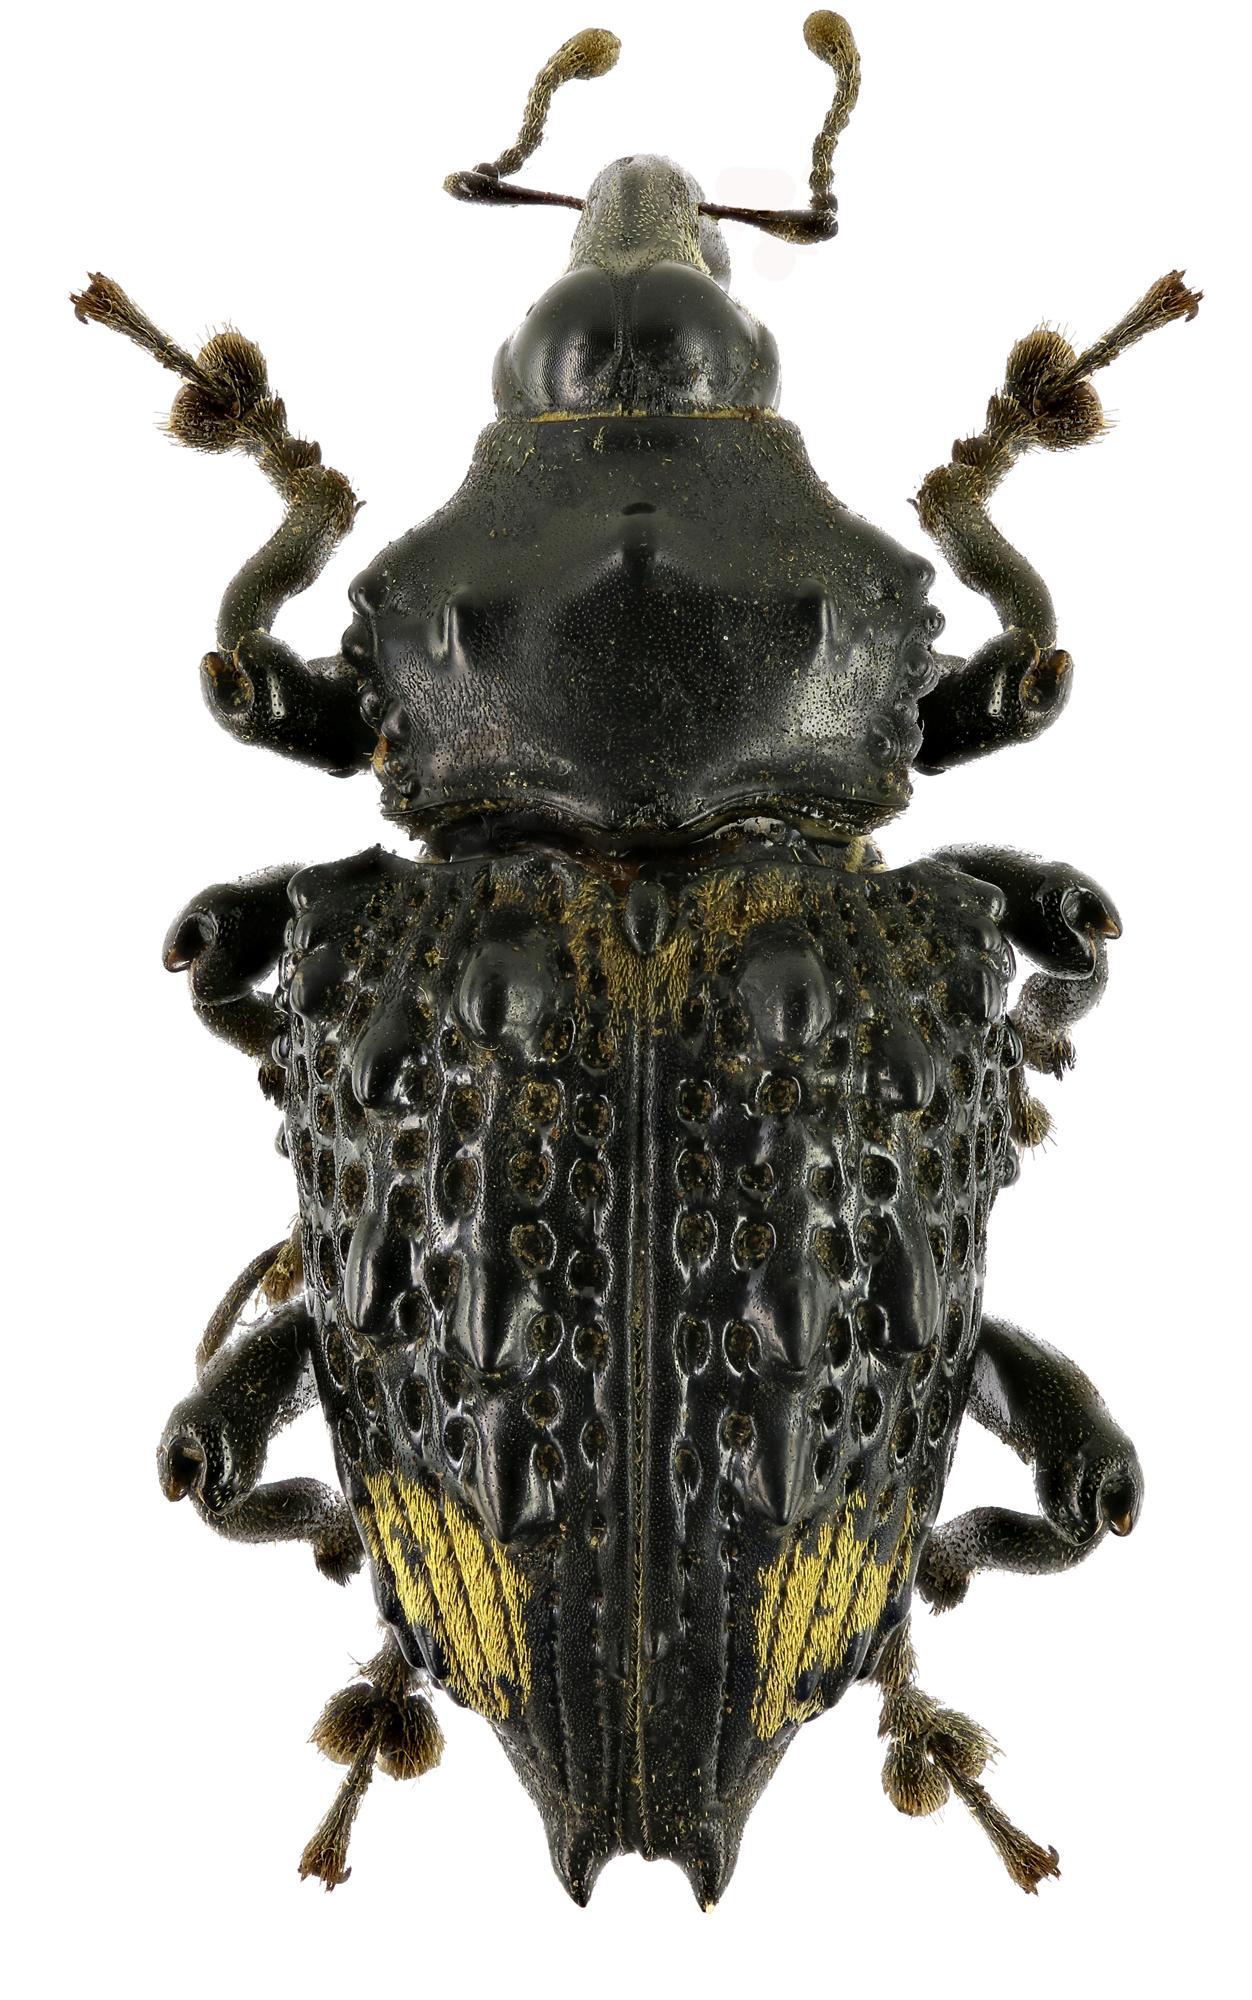 Cratosomus vaginalis f EOS70D4348cz85.jpg